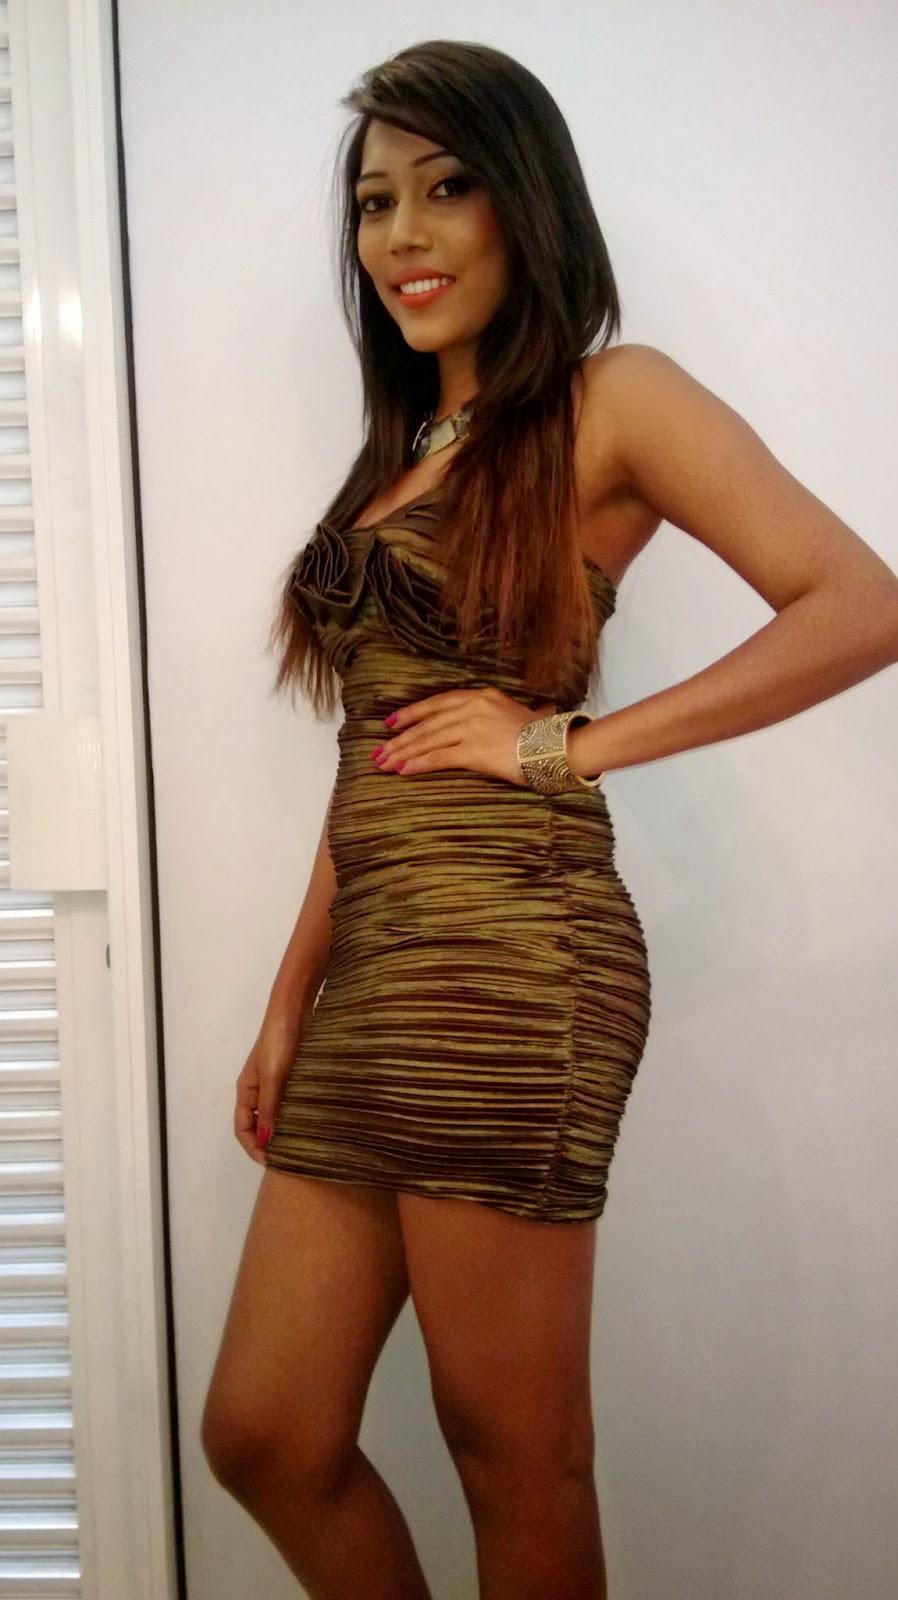 Thilini de silva short skirt